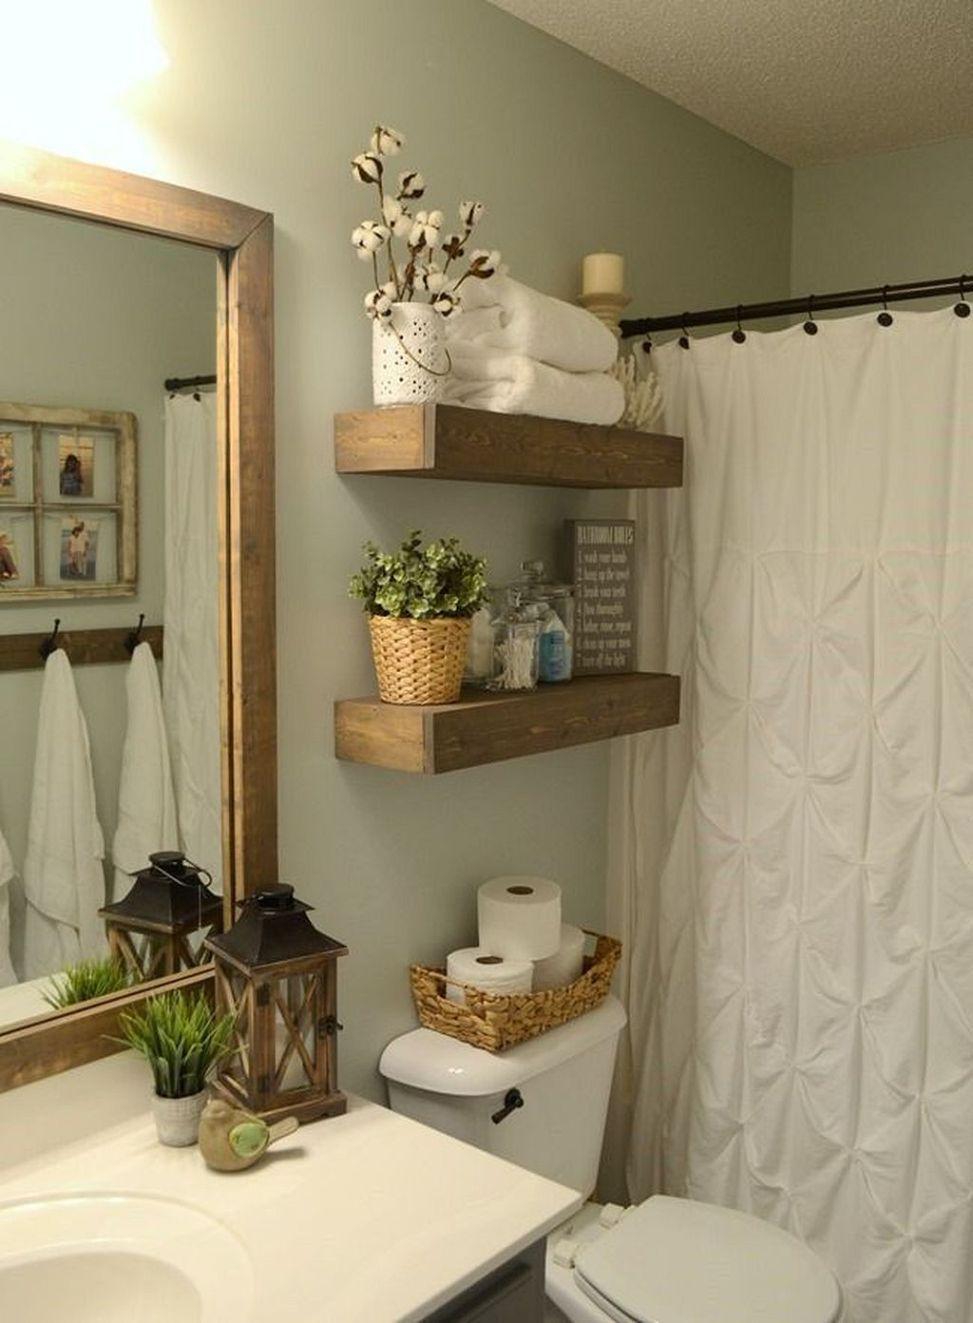 Modernes badezimmerdekor 2018 classy diy home decor rustic ideas in   diyhomedecorbathroom